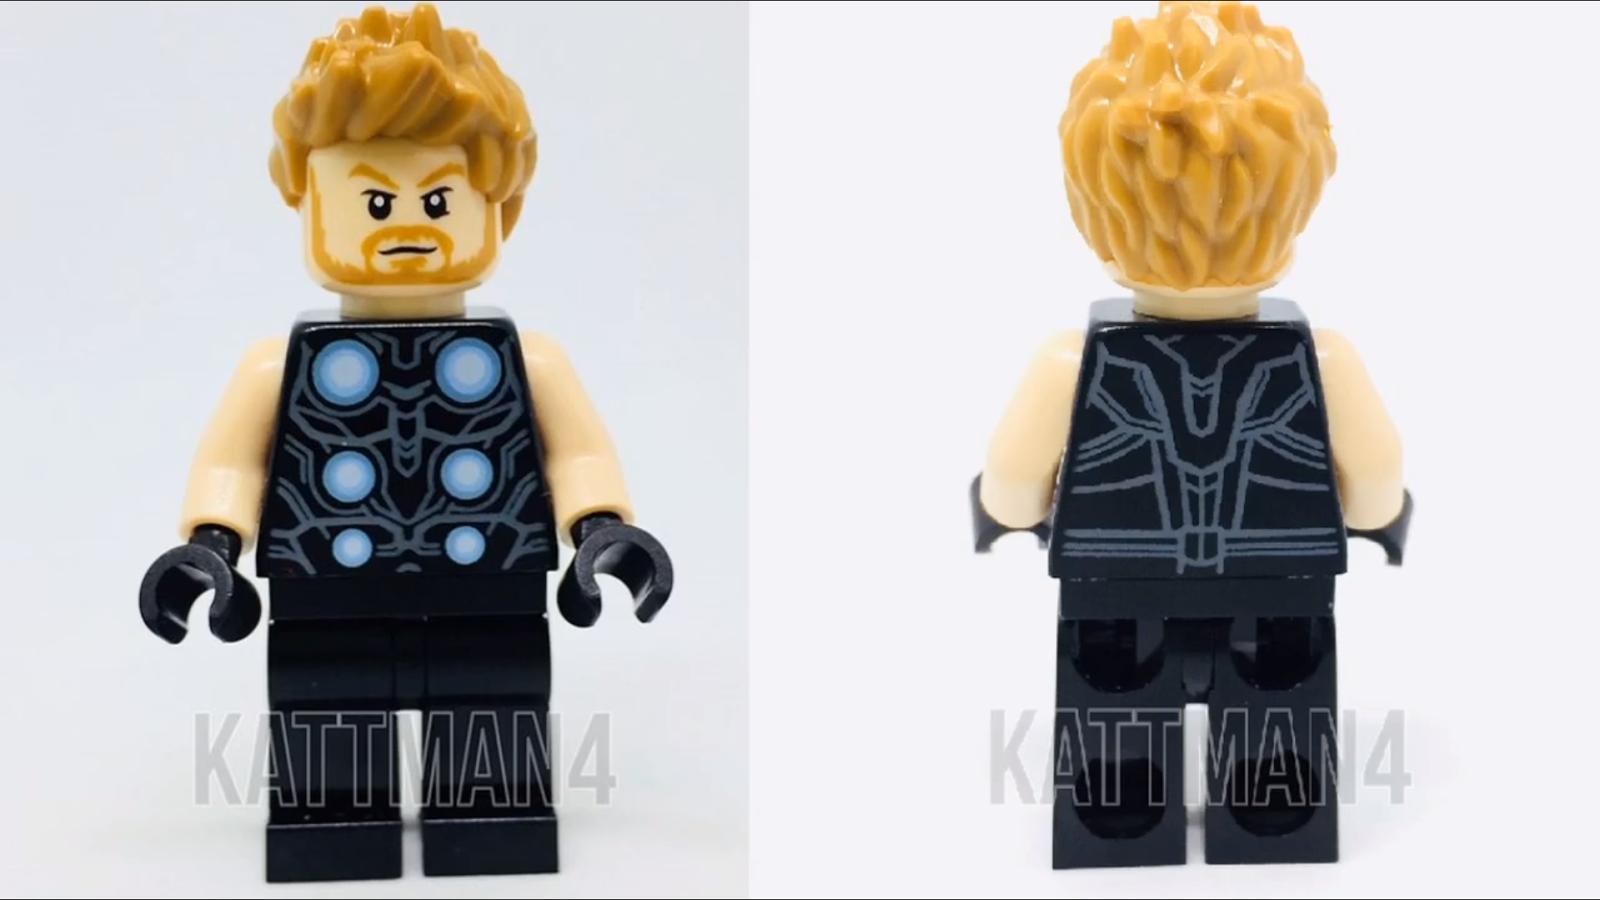 Anj S Brick Blog Lego Avengers Infinity War Minifigures Images Revealed